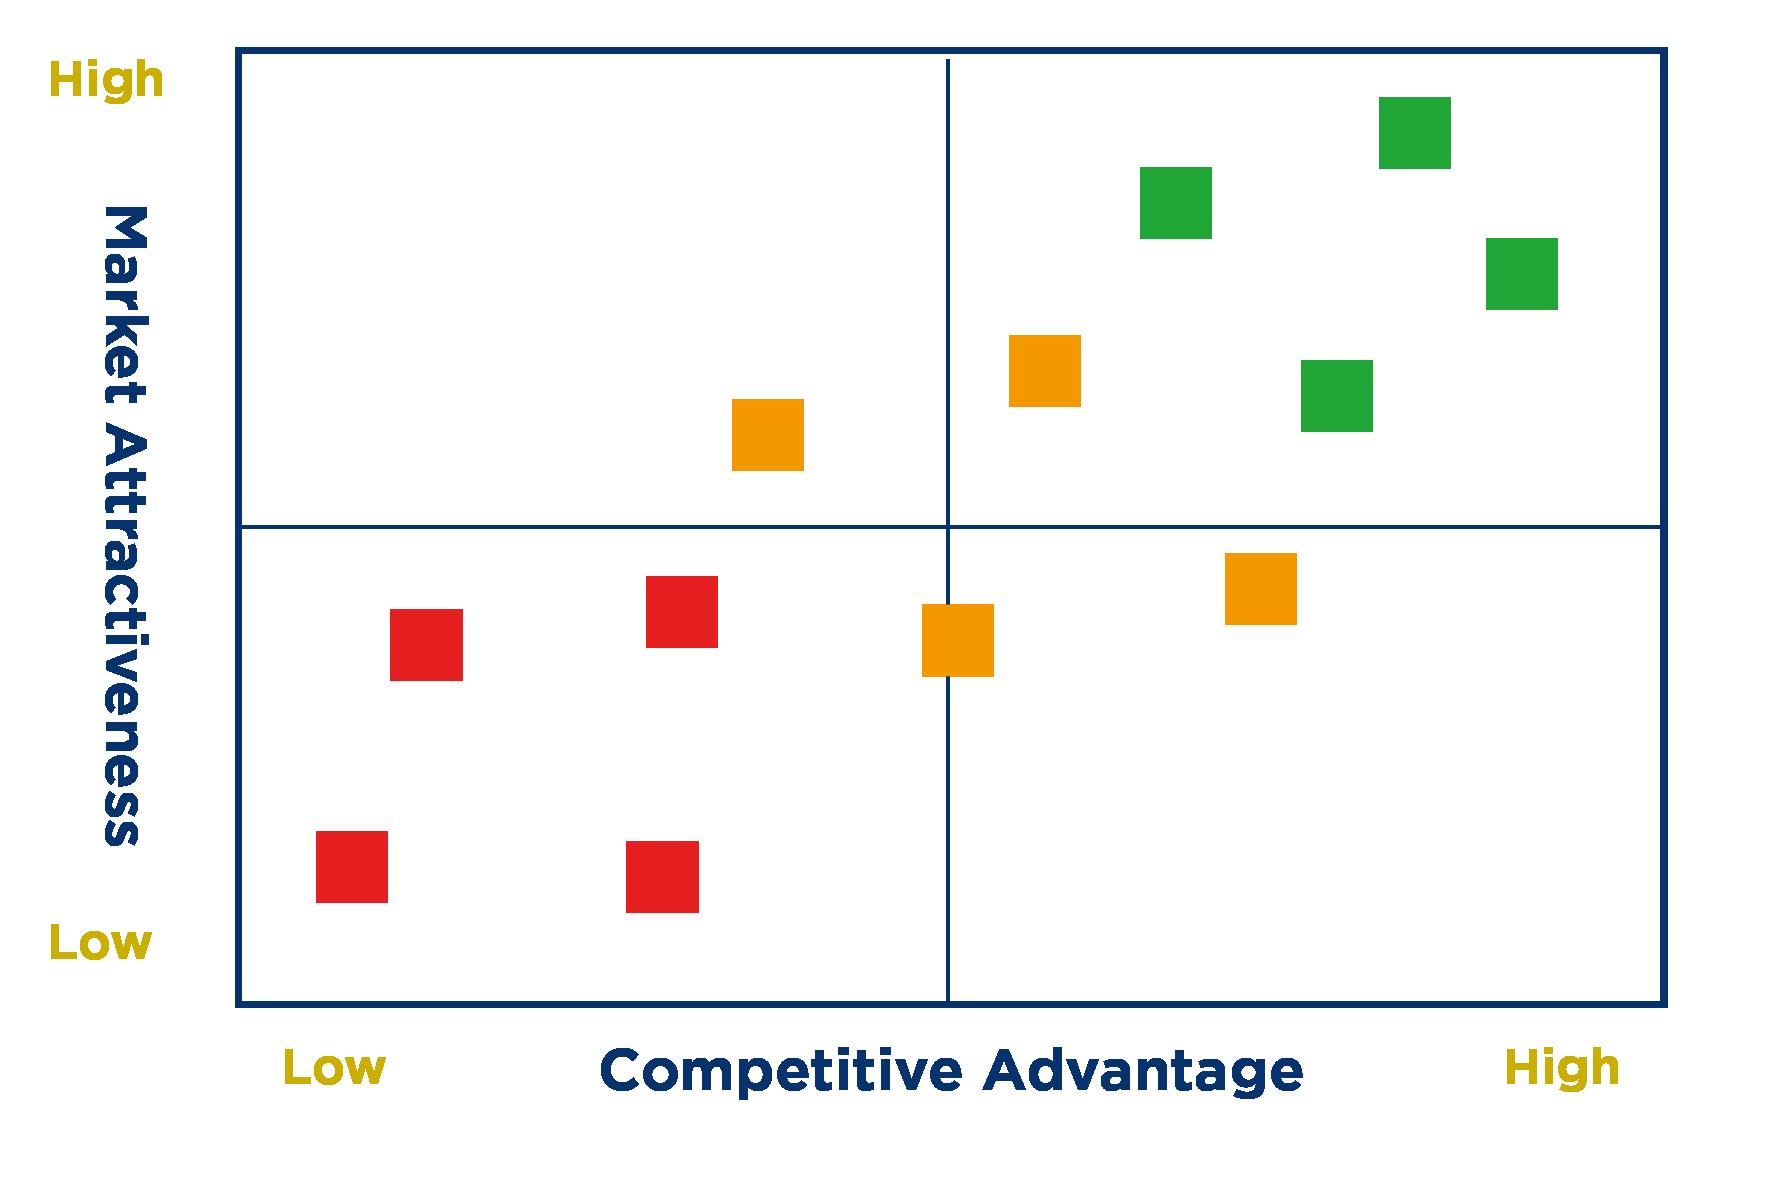 nem-cama-compeitive-advantage-market-attractiveness